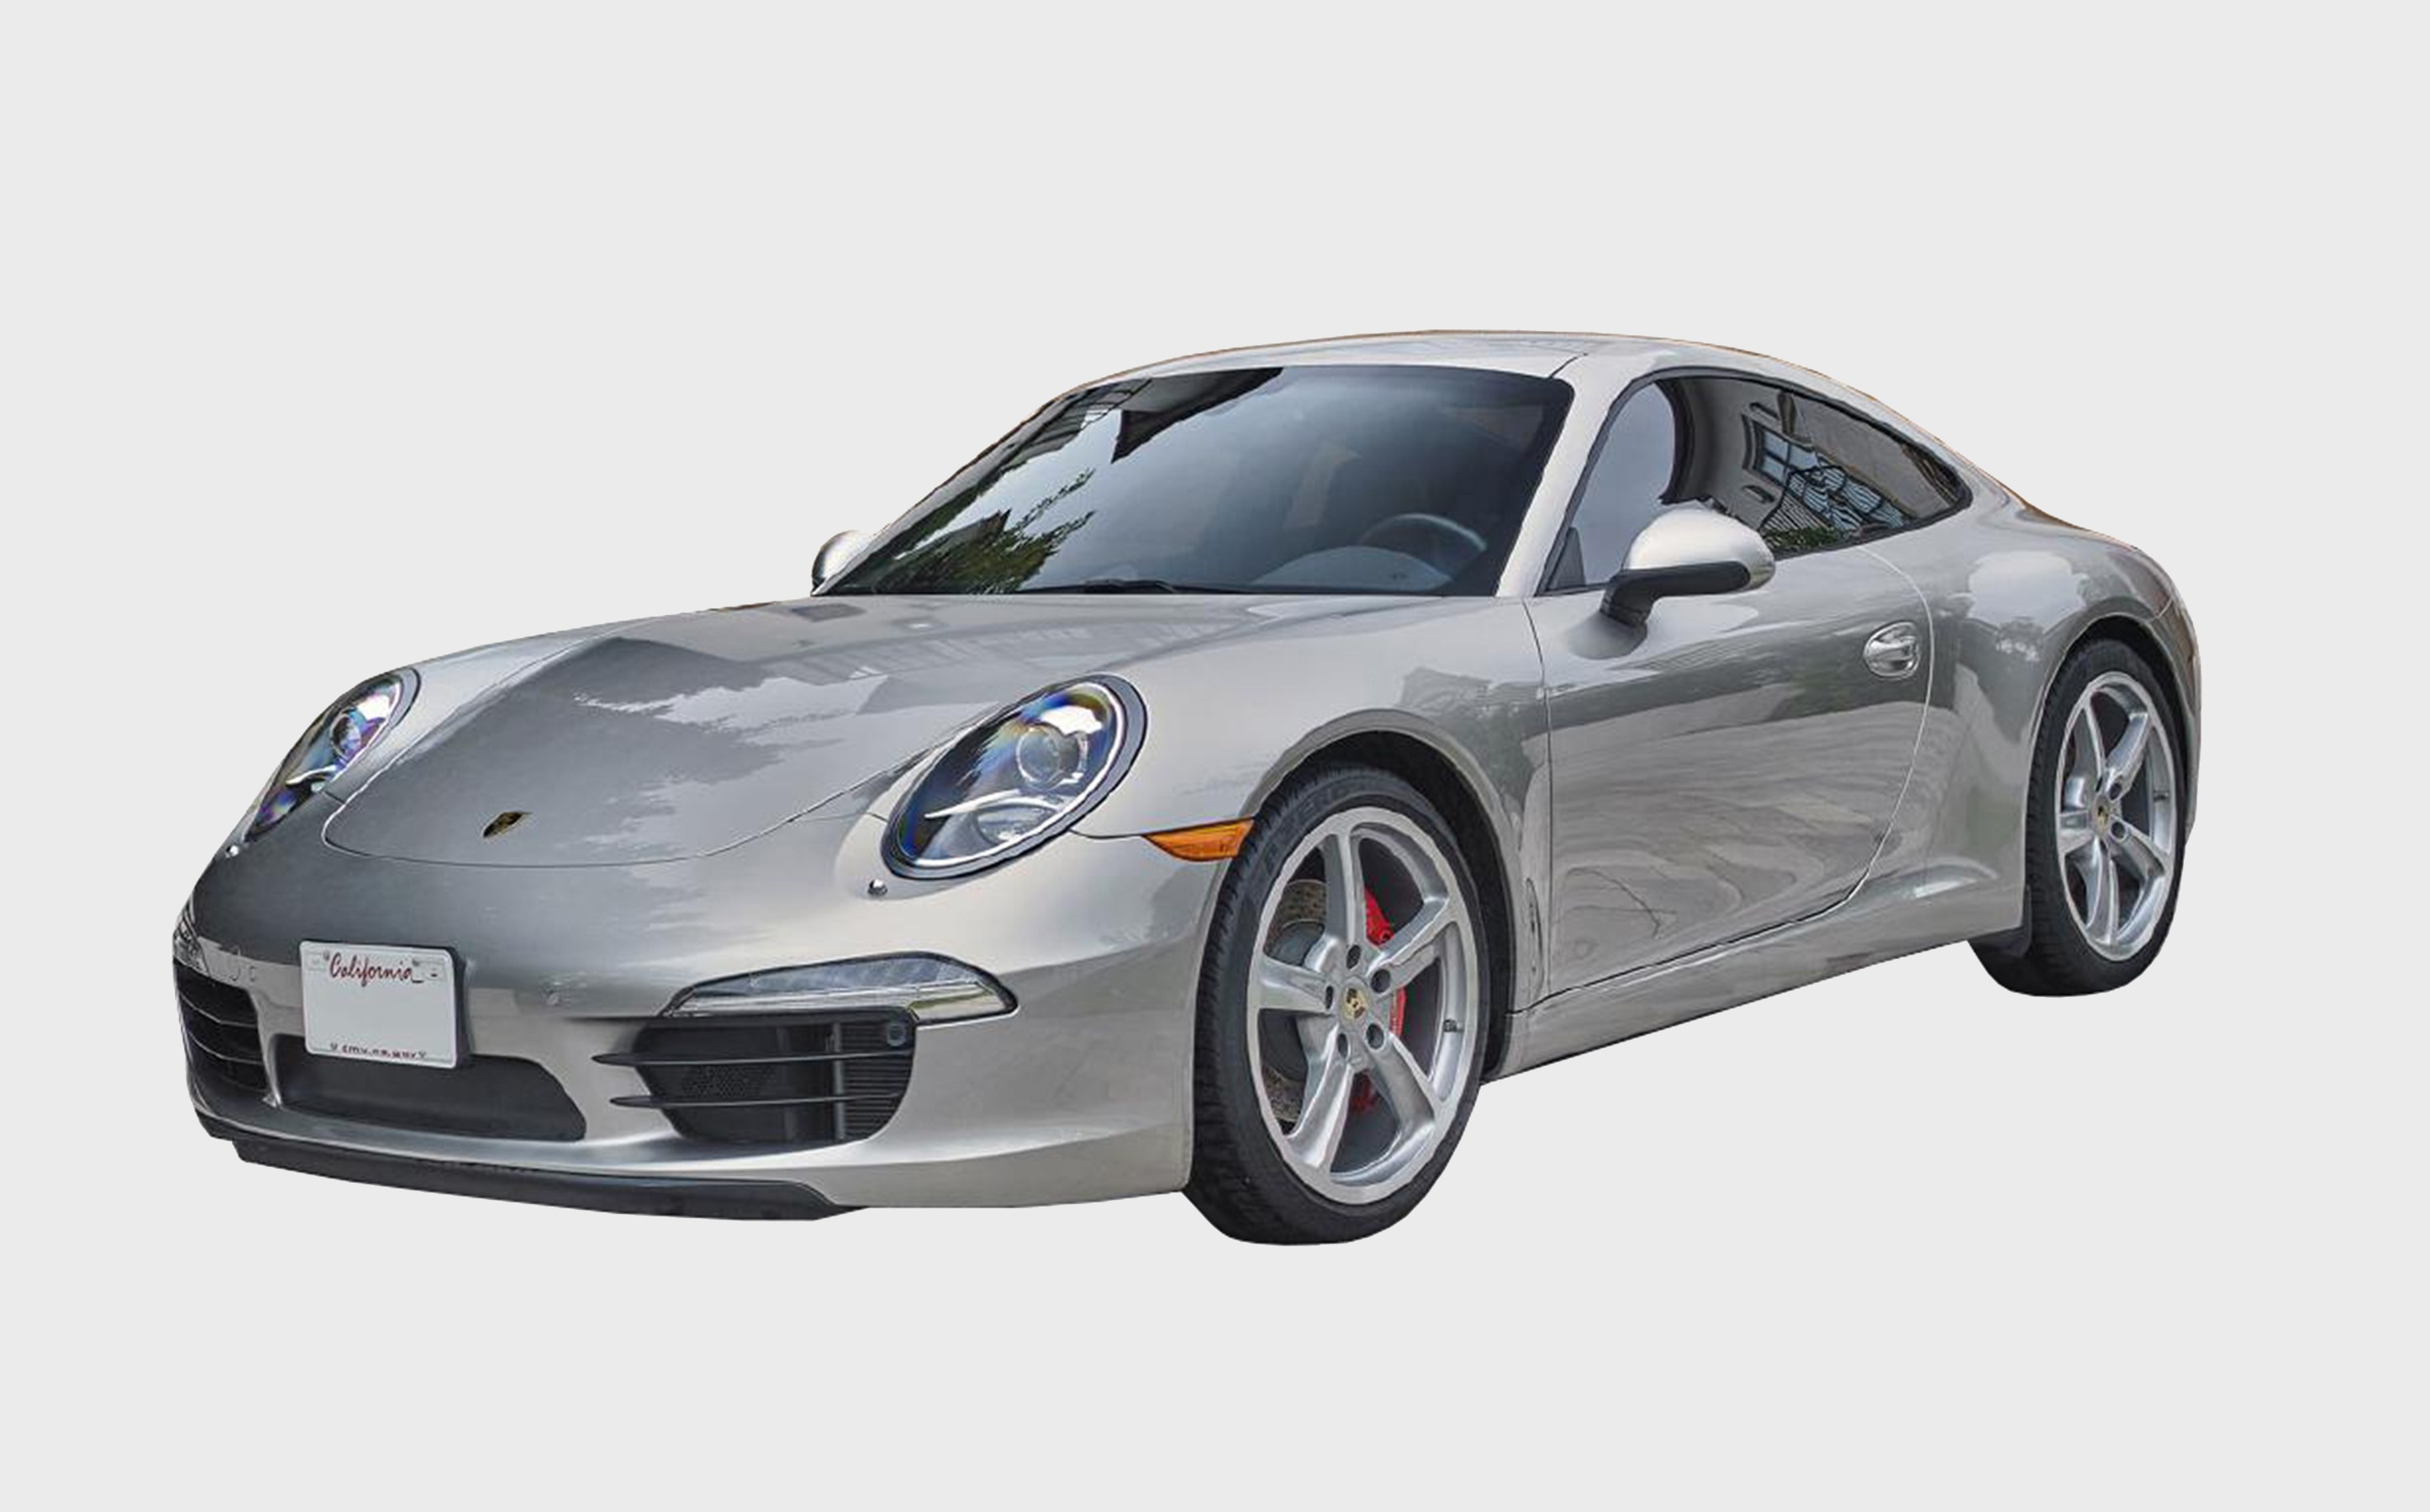 2012 Porsche 991 Carrera S Coupe